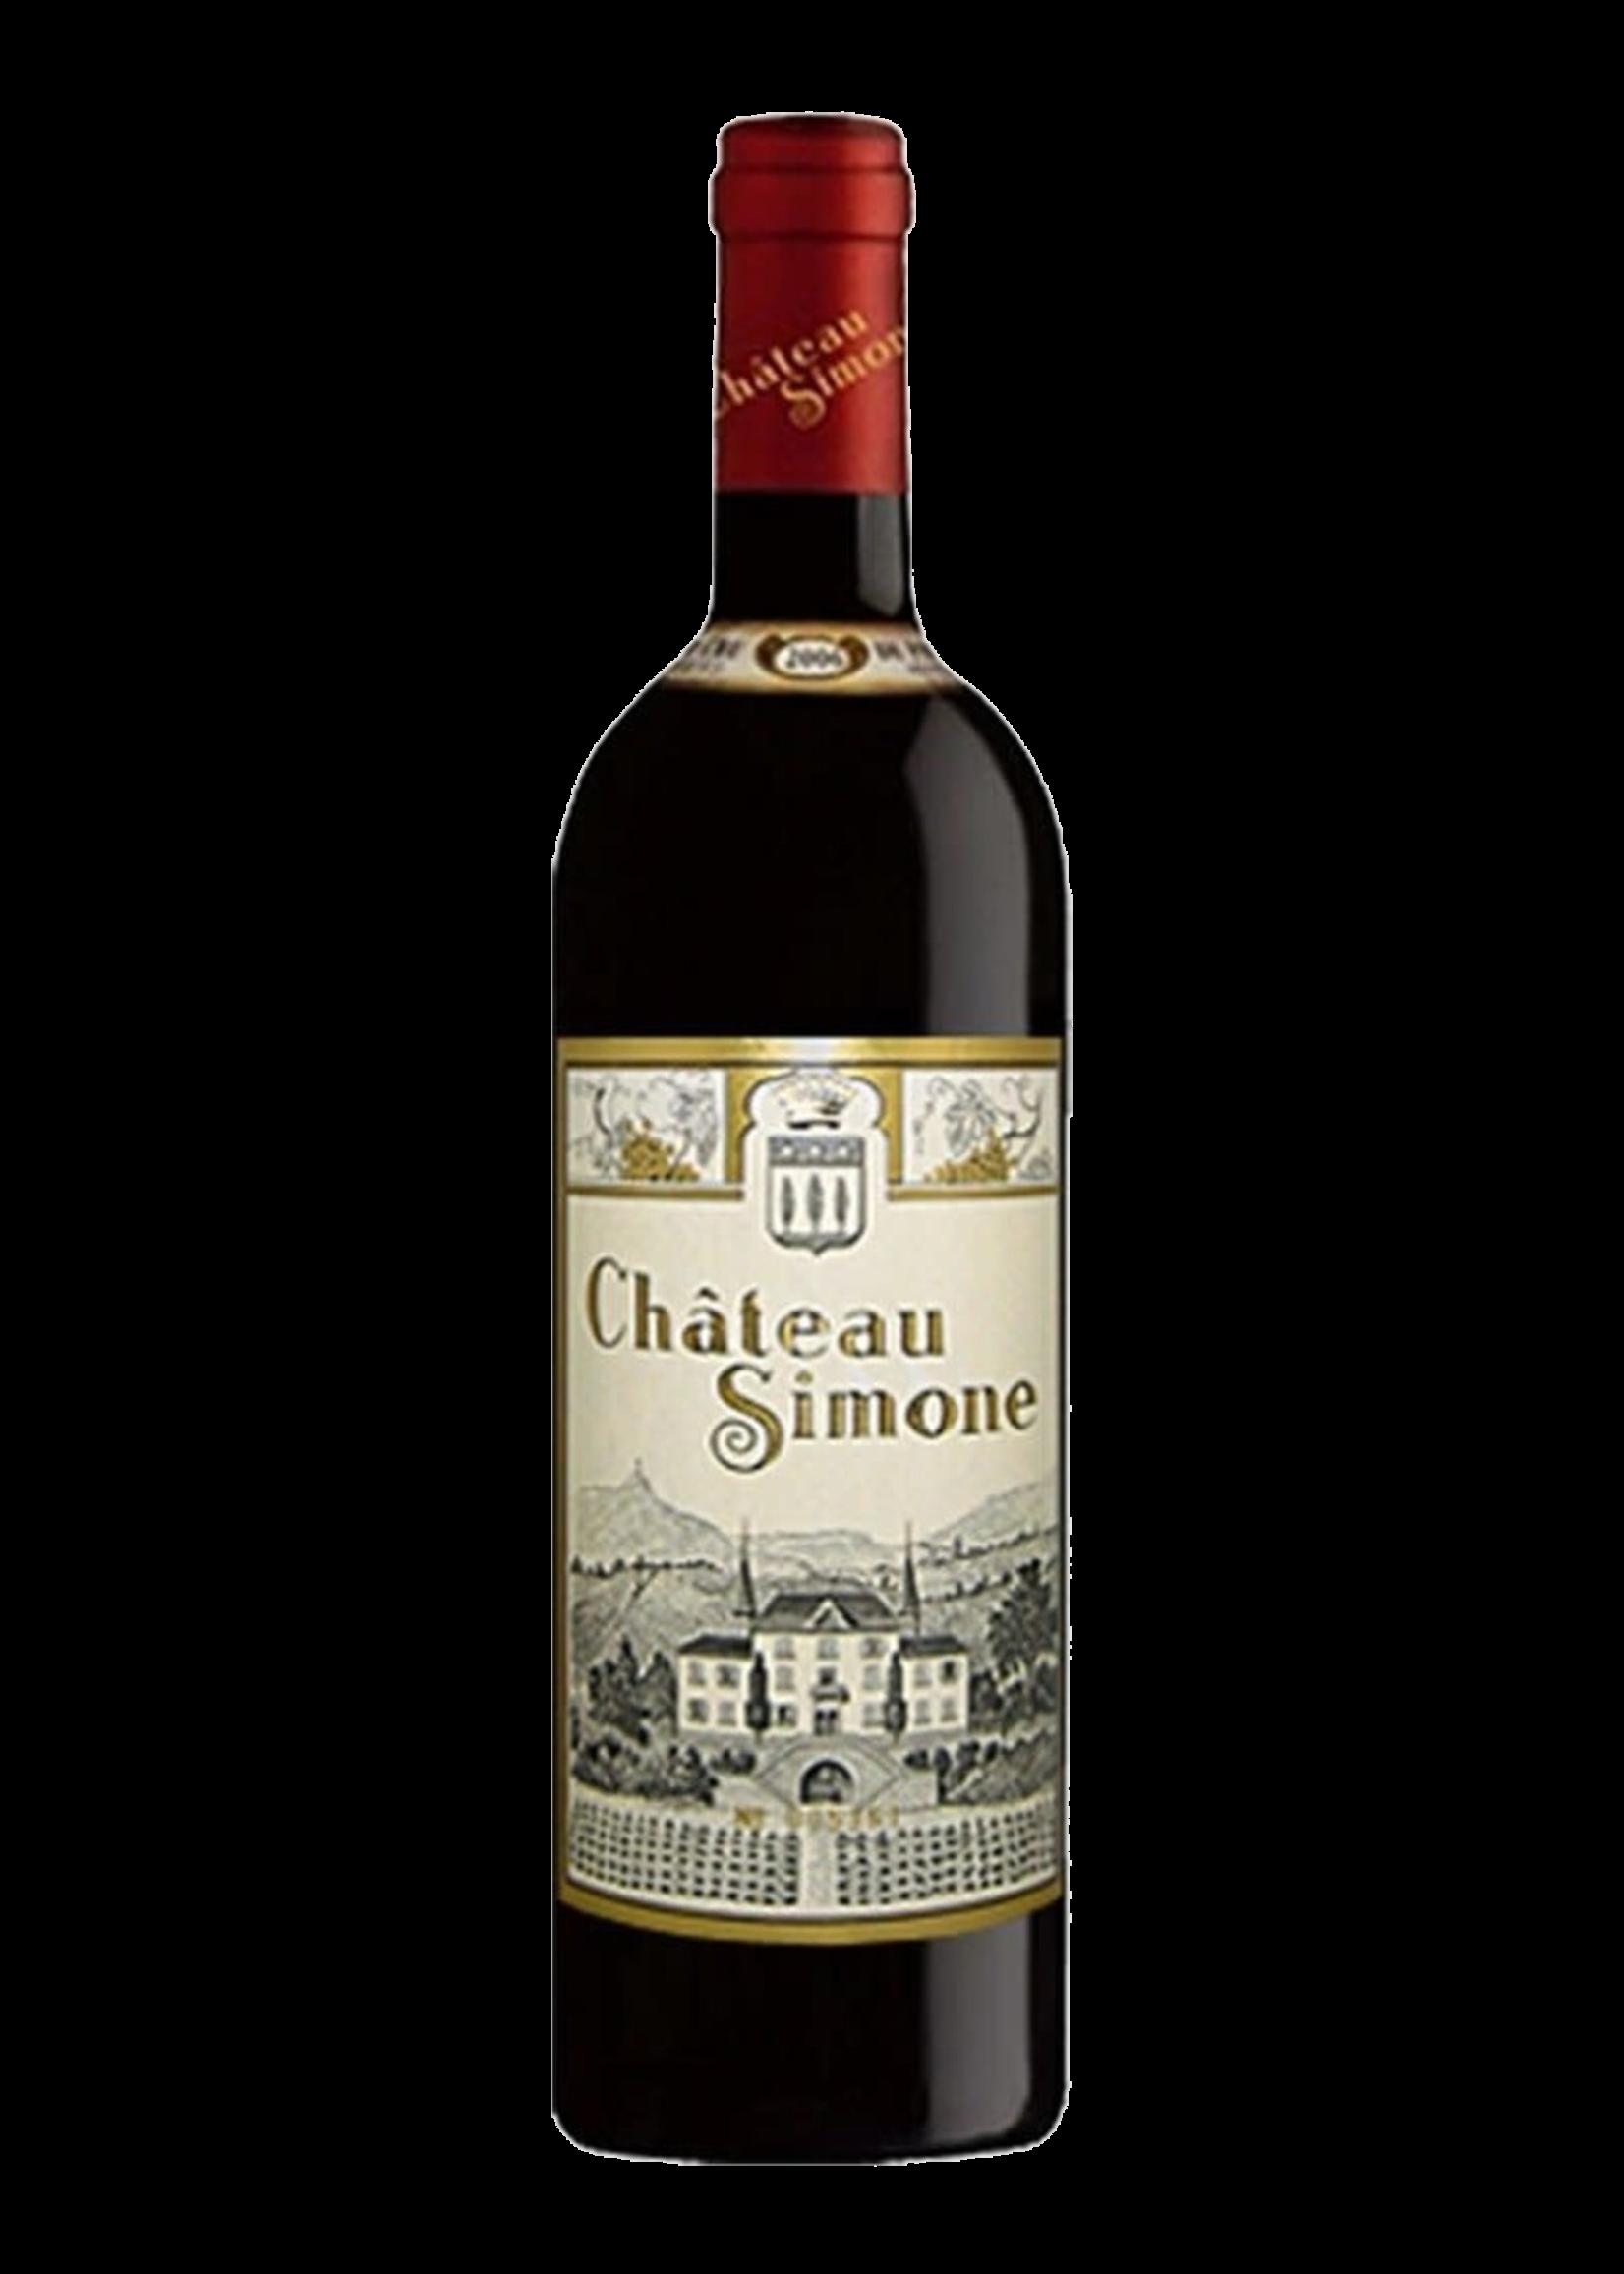 Château Simone Château Simone / Palette Rouge 2011 / 750mL